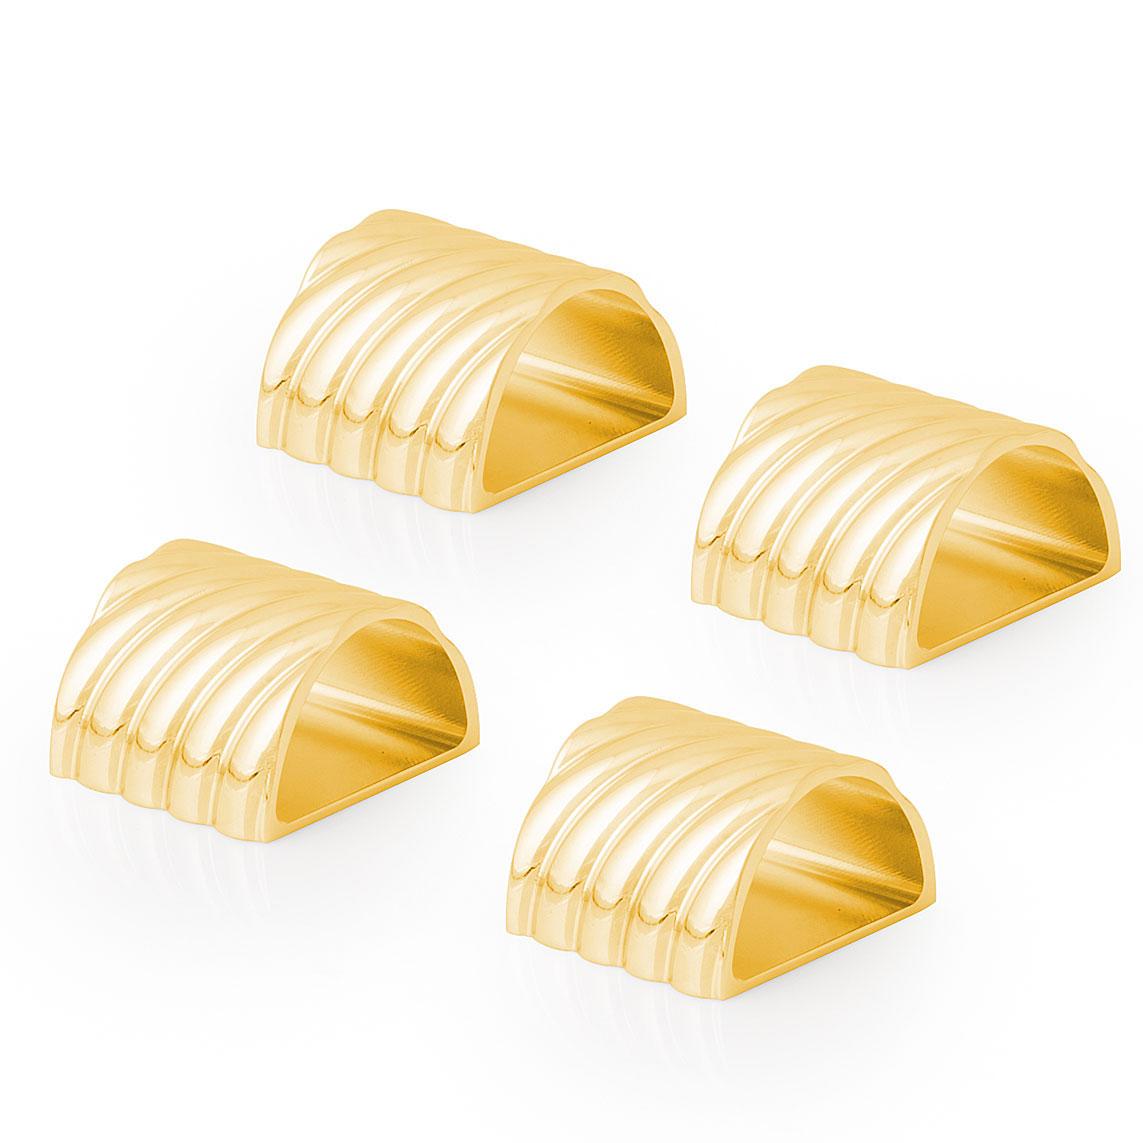 Michael Aram Twist Napkin Ring Set of 4 - Goldtone